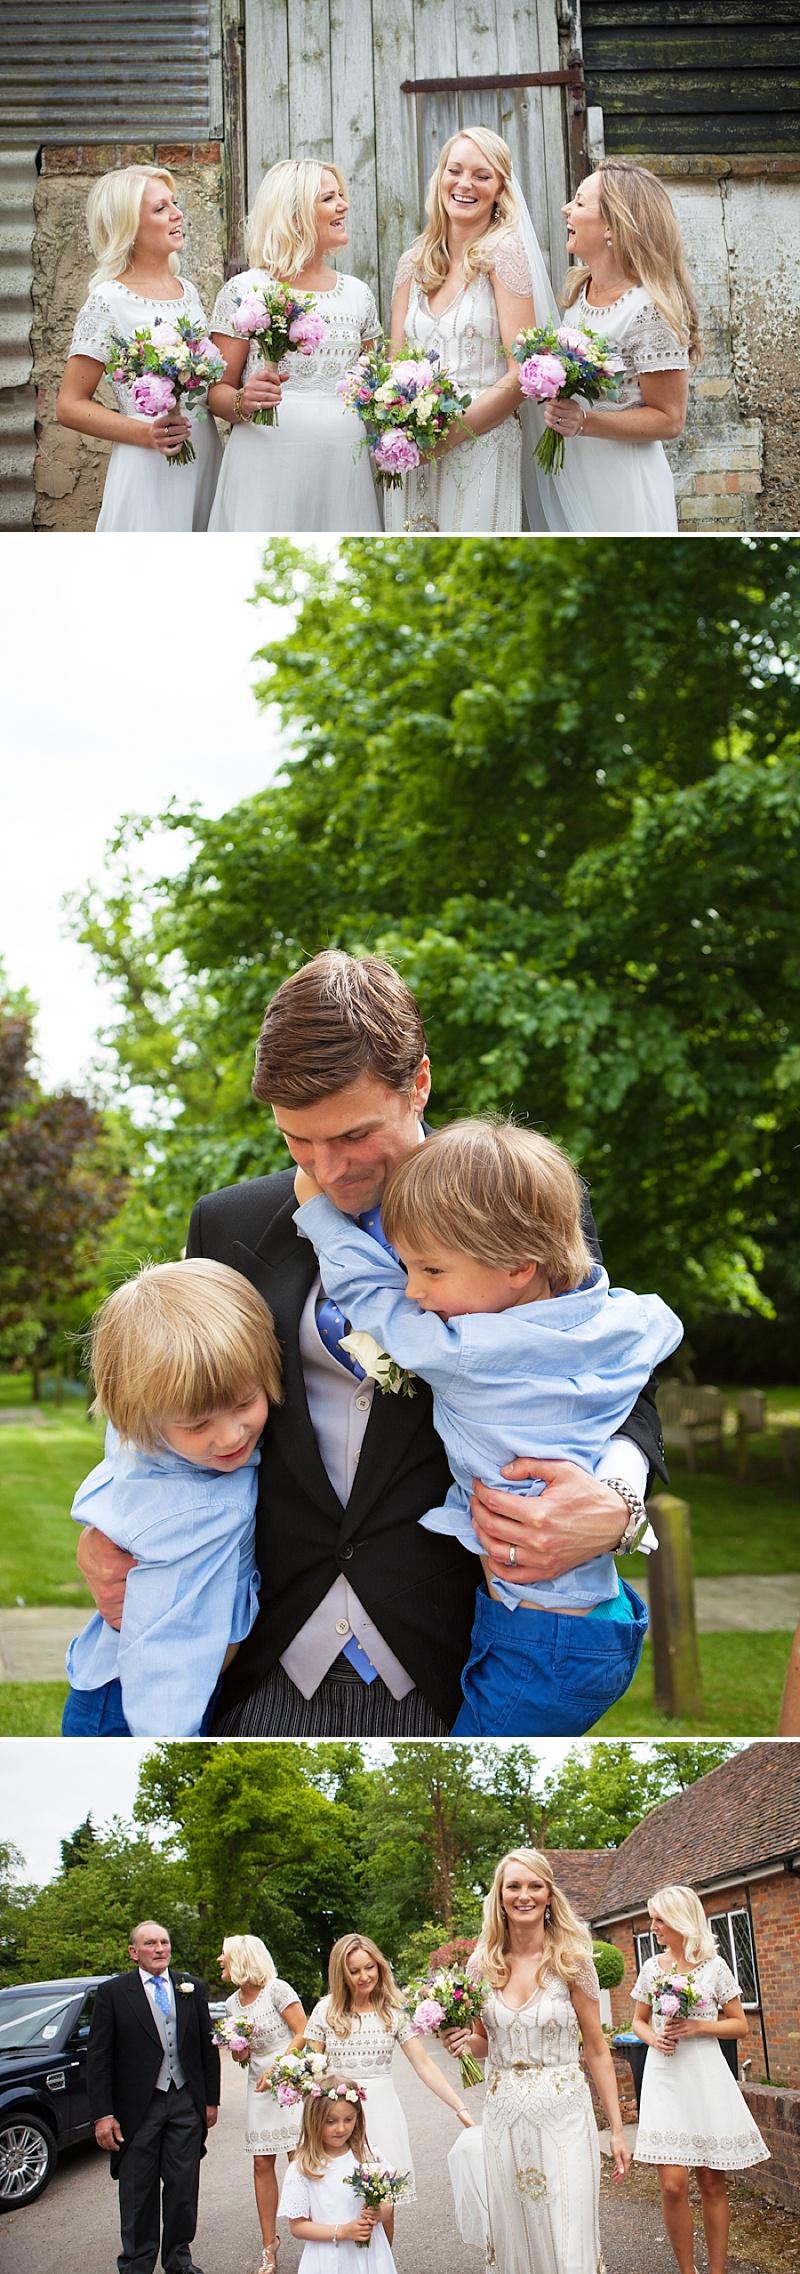 Summer Garden Party Wedding In Hertfordshire, Bride In Jenny Packham Eden Gown, Images by Annamarie Stepney_0005